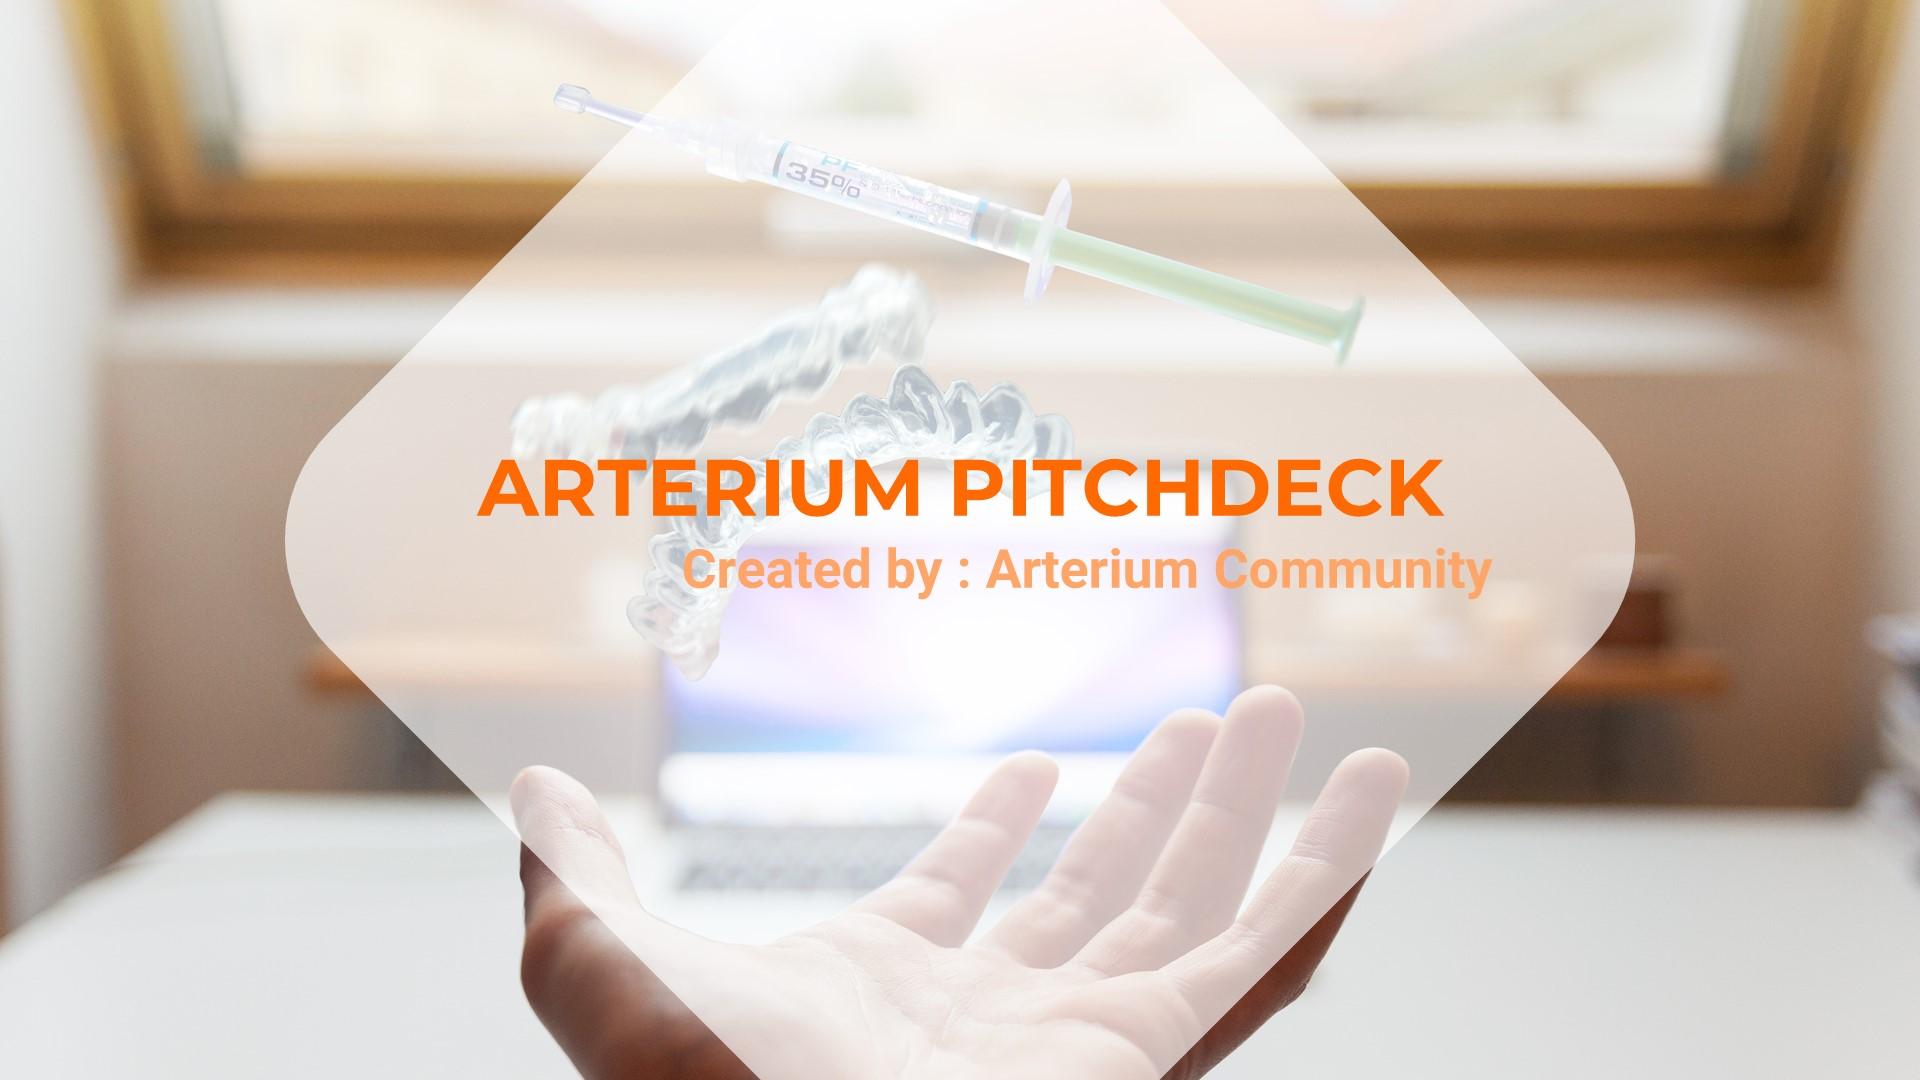 Arterium - Creative Medic PowerPoint sablon 87430